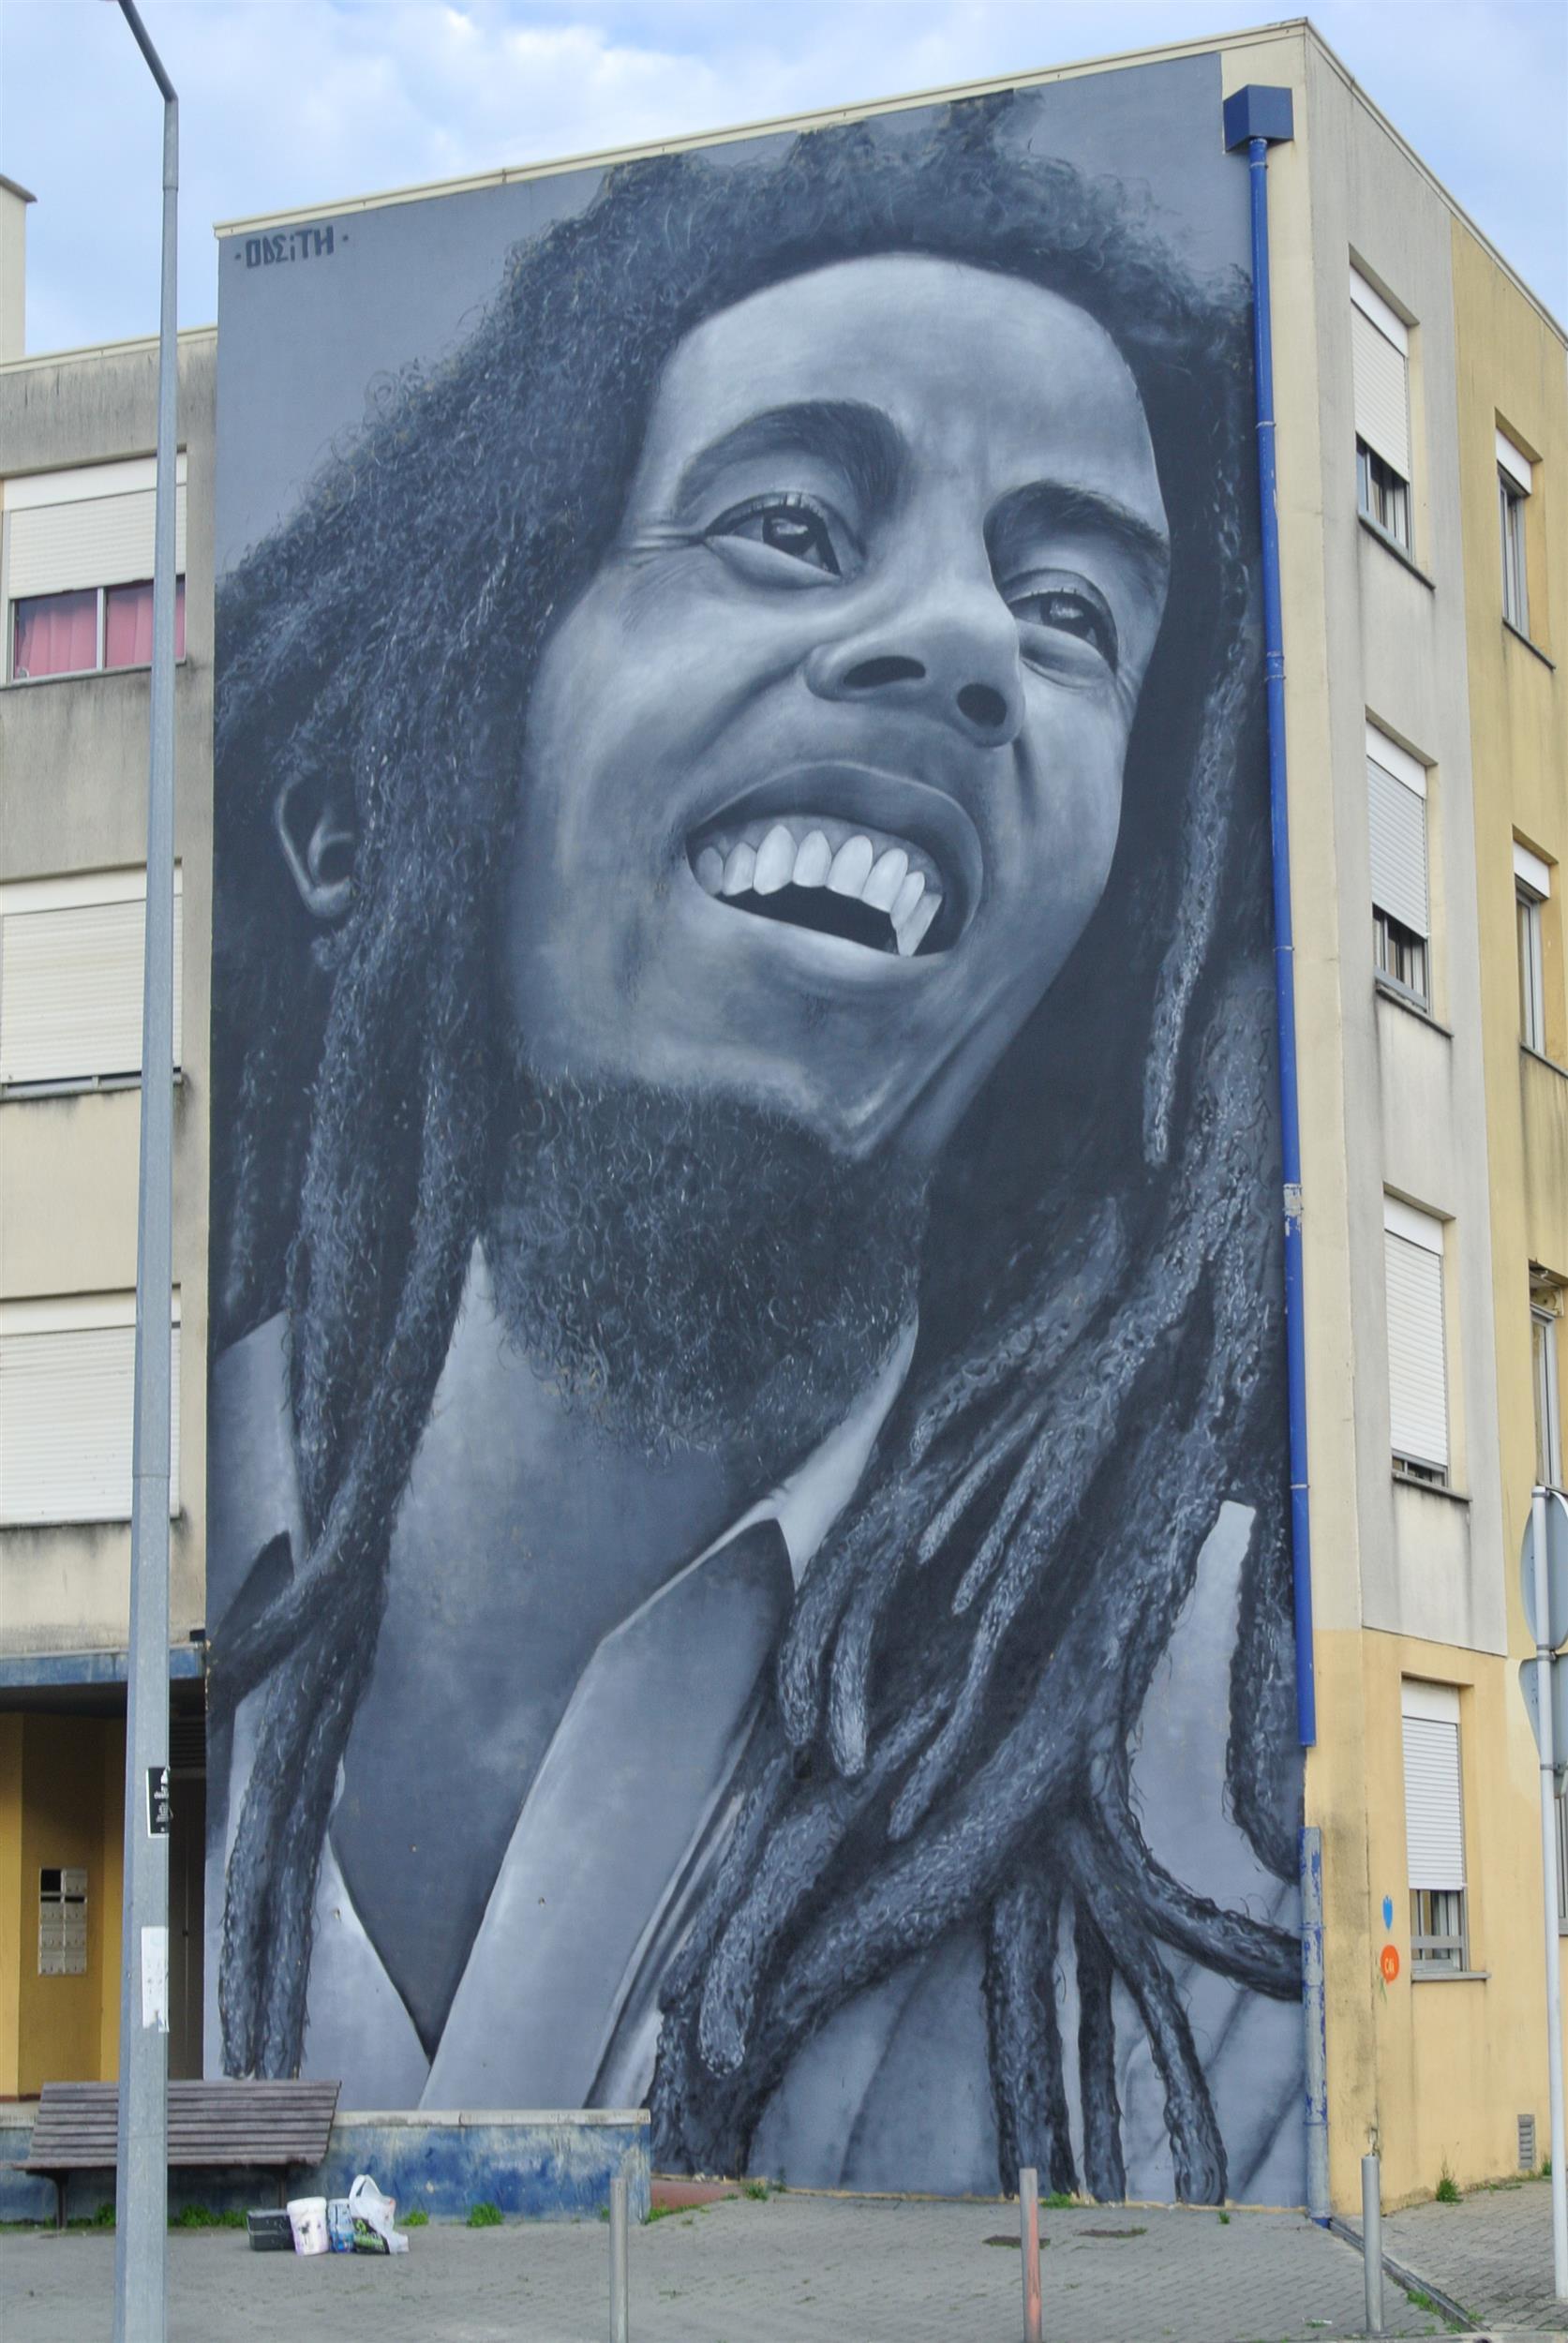 TILSITT GALLERY ODEITH Bob Marley Tribute street art Mural - O bairro e o mundo - Loures (1)